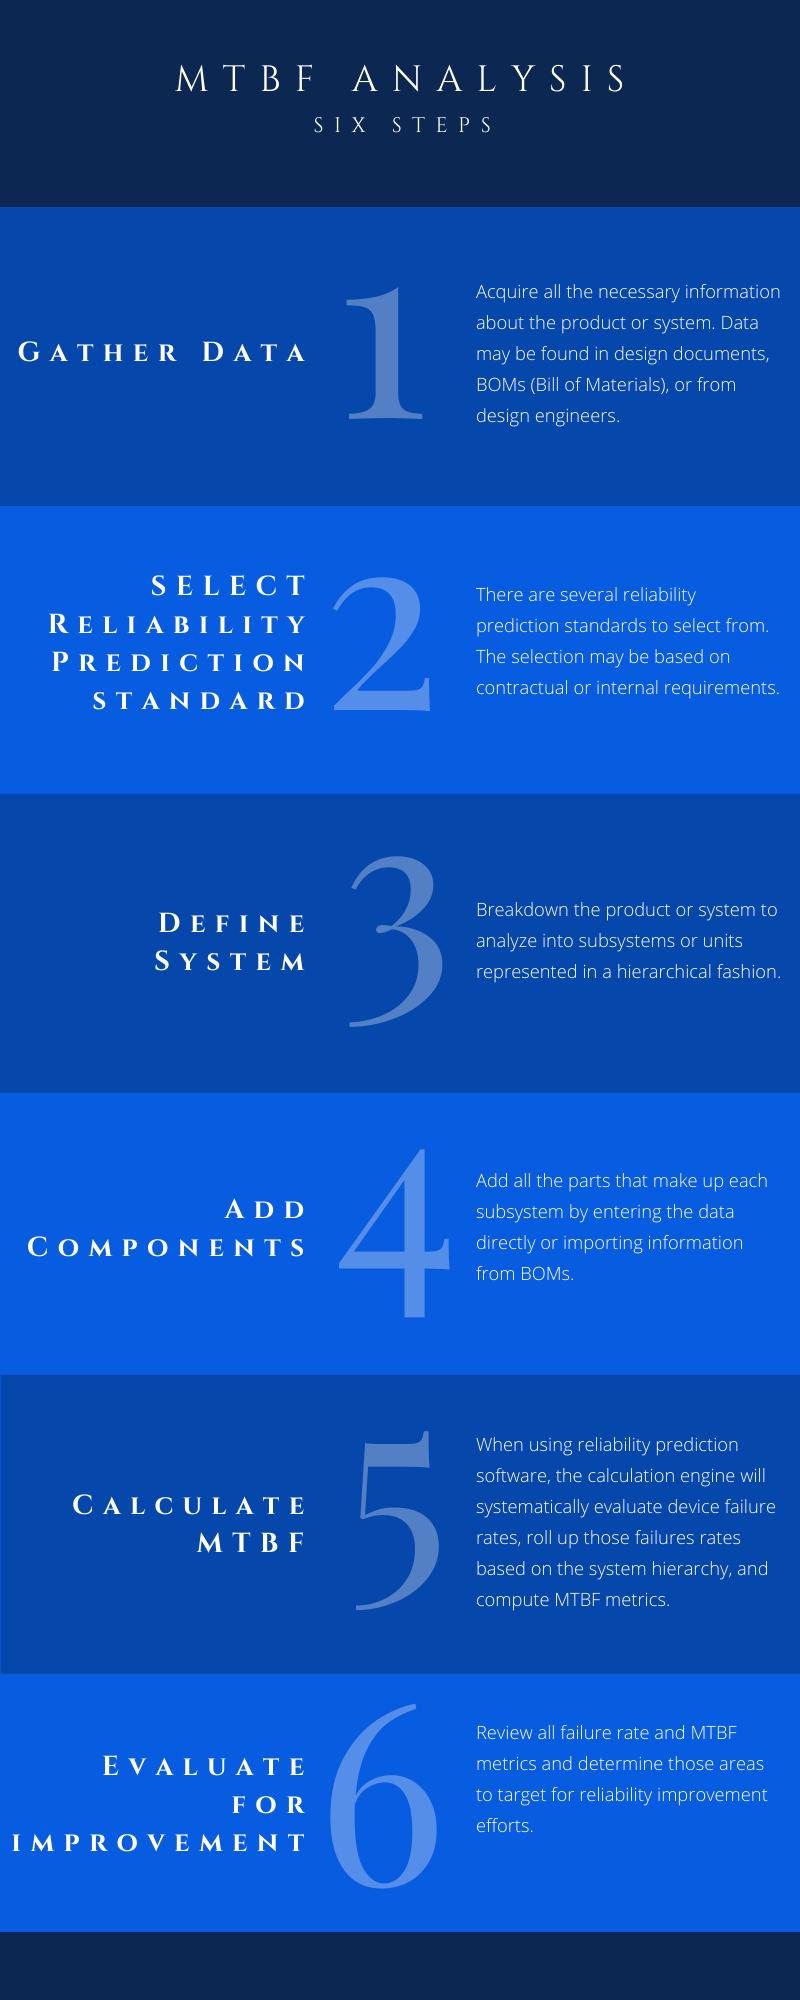 MTBF Analysis 6 Step Infographic